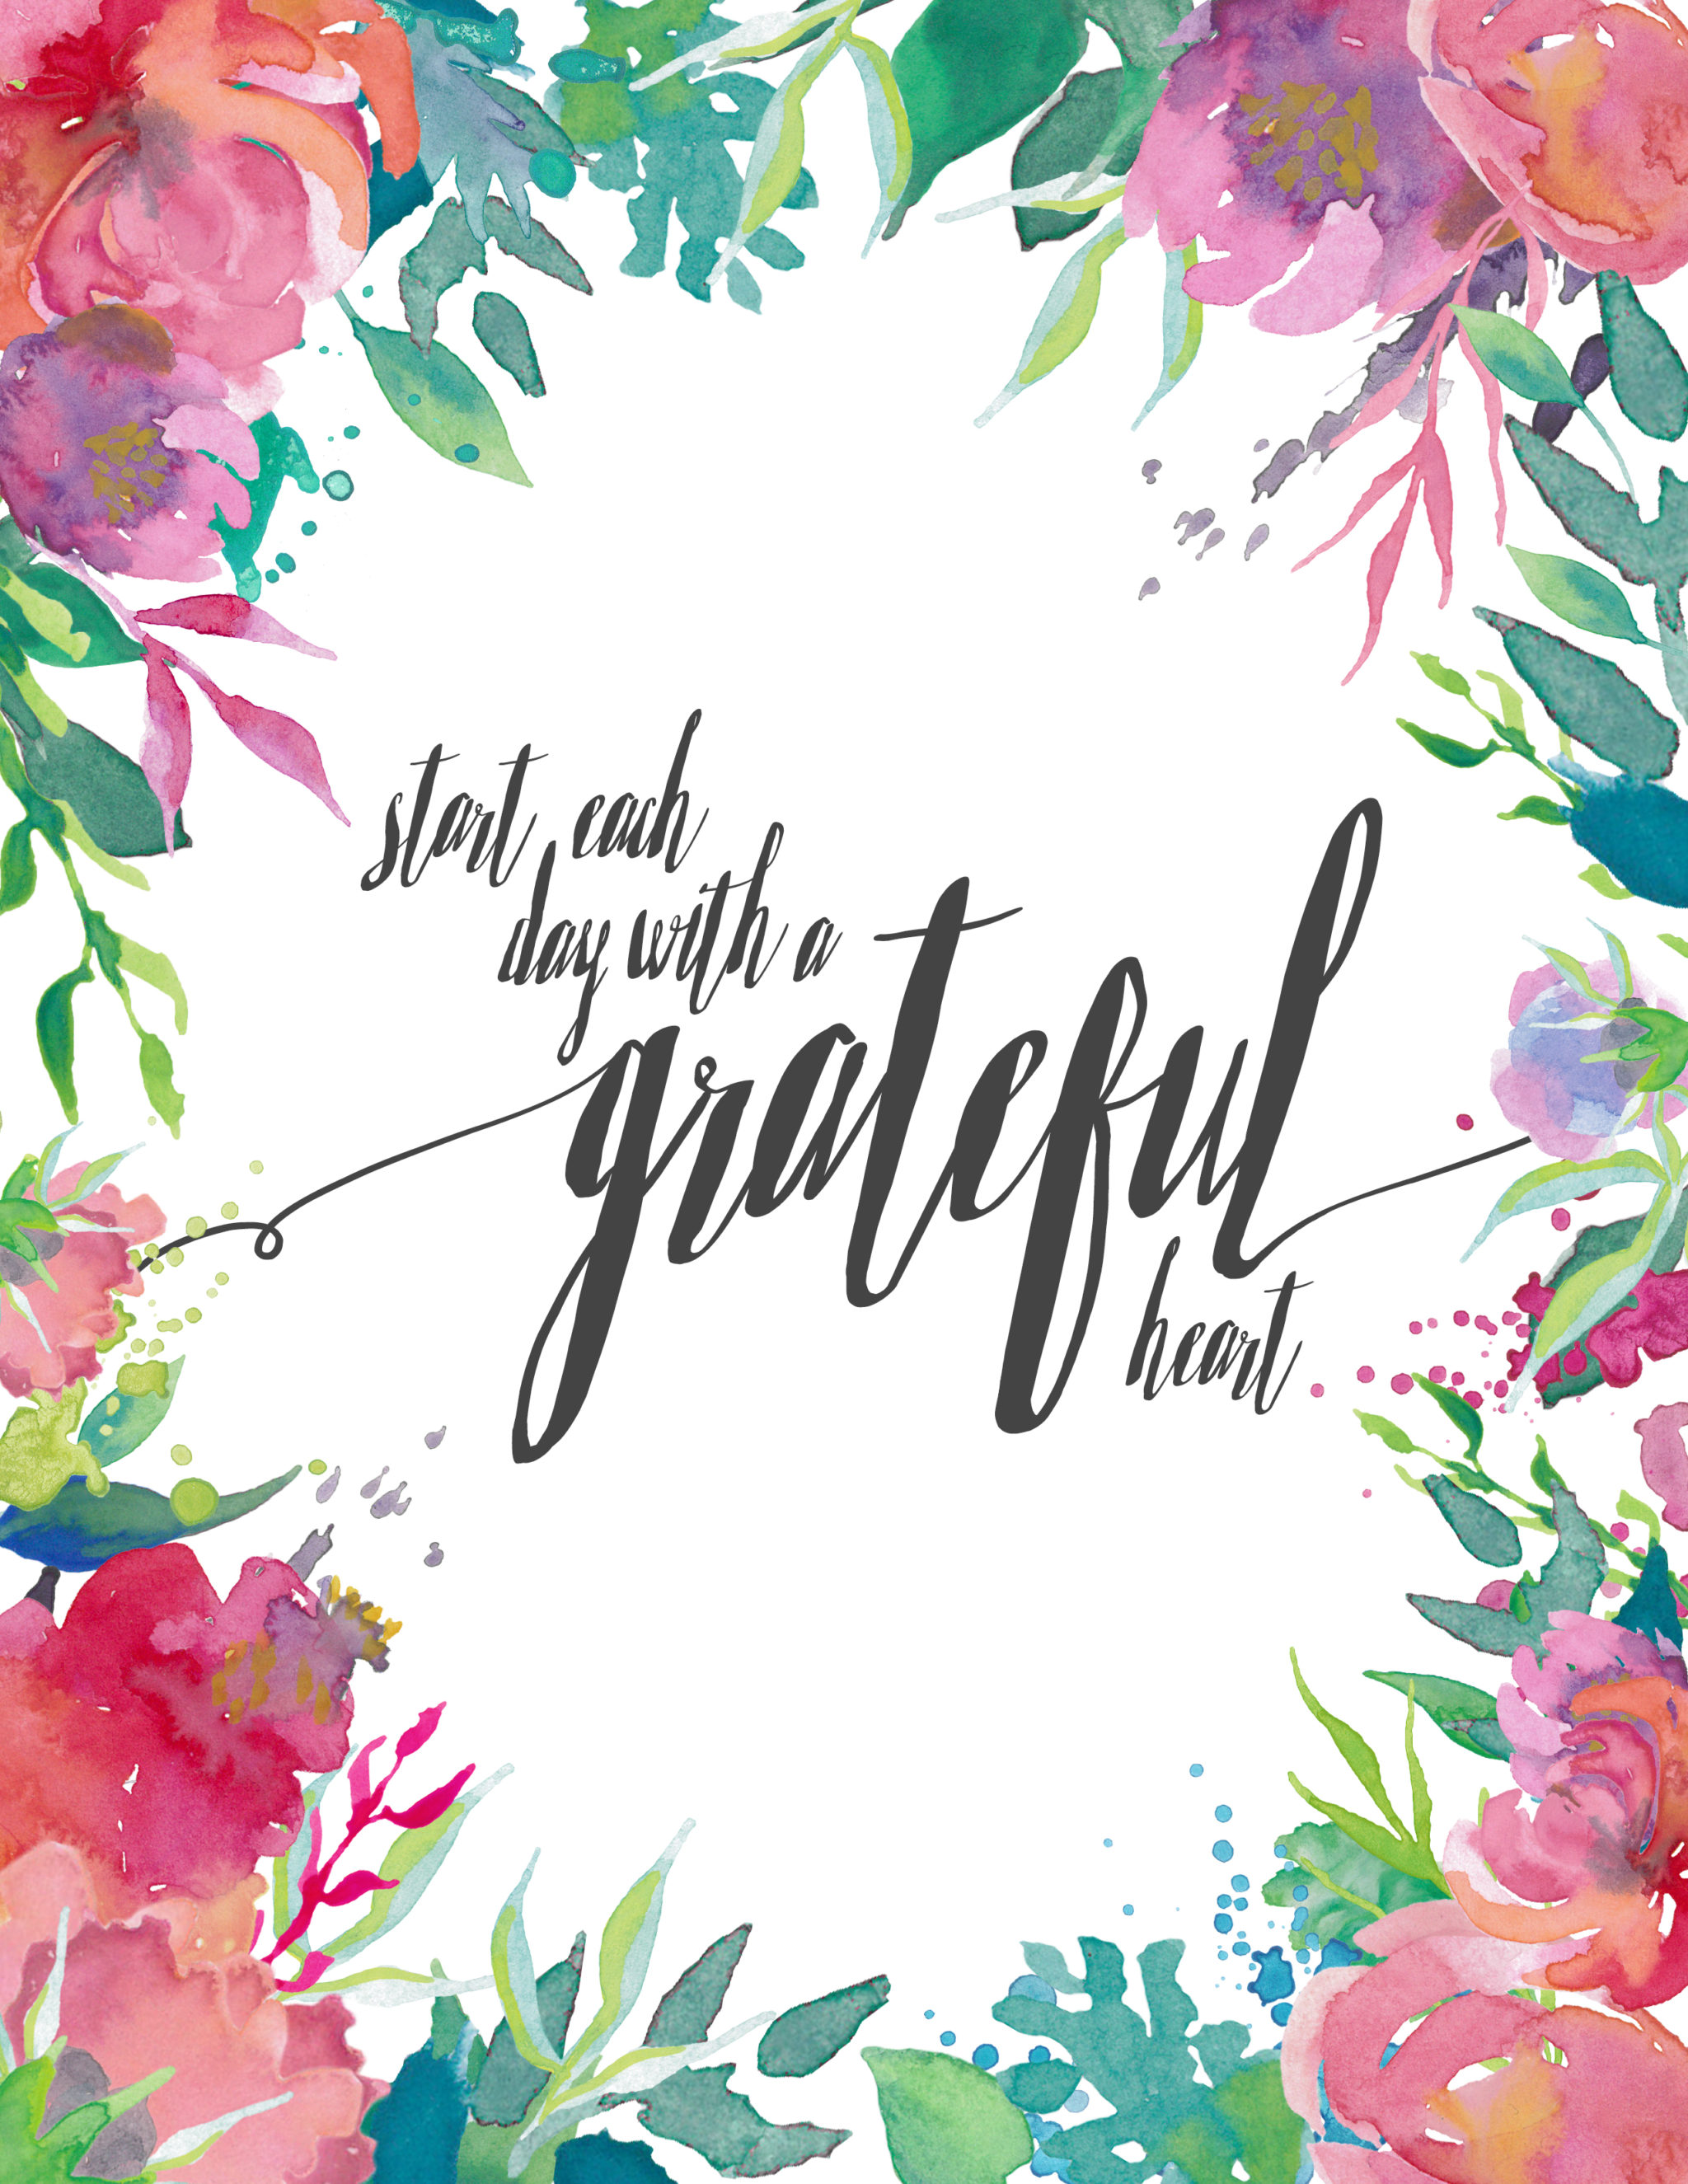 Spring Printable_Start Each Day